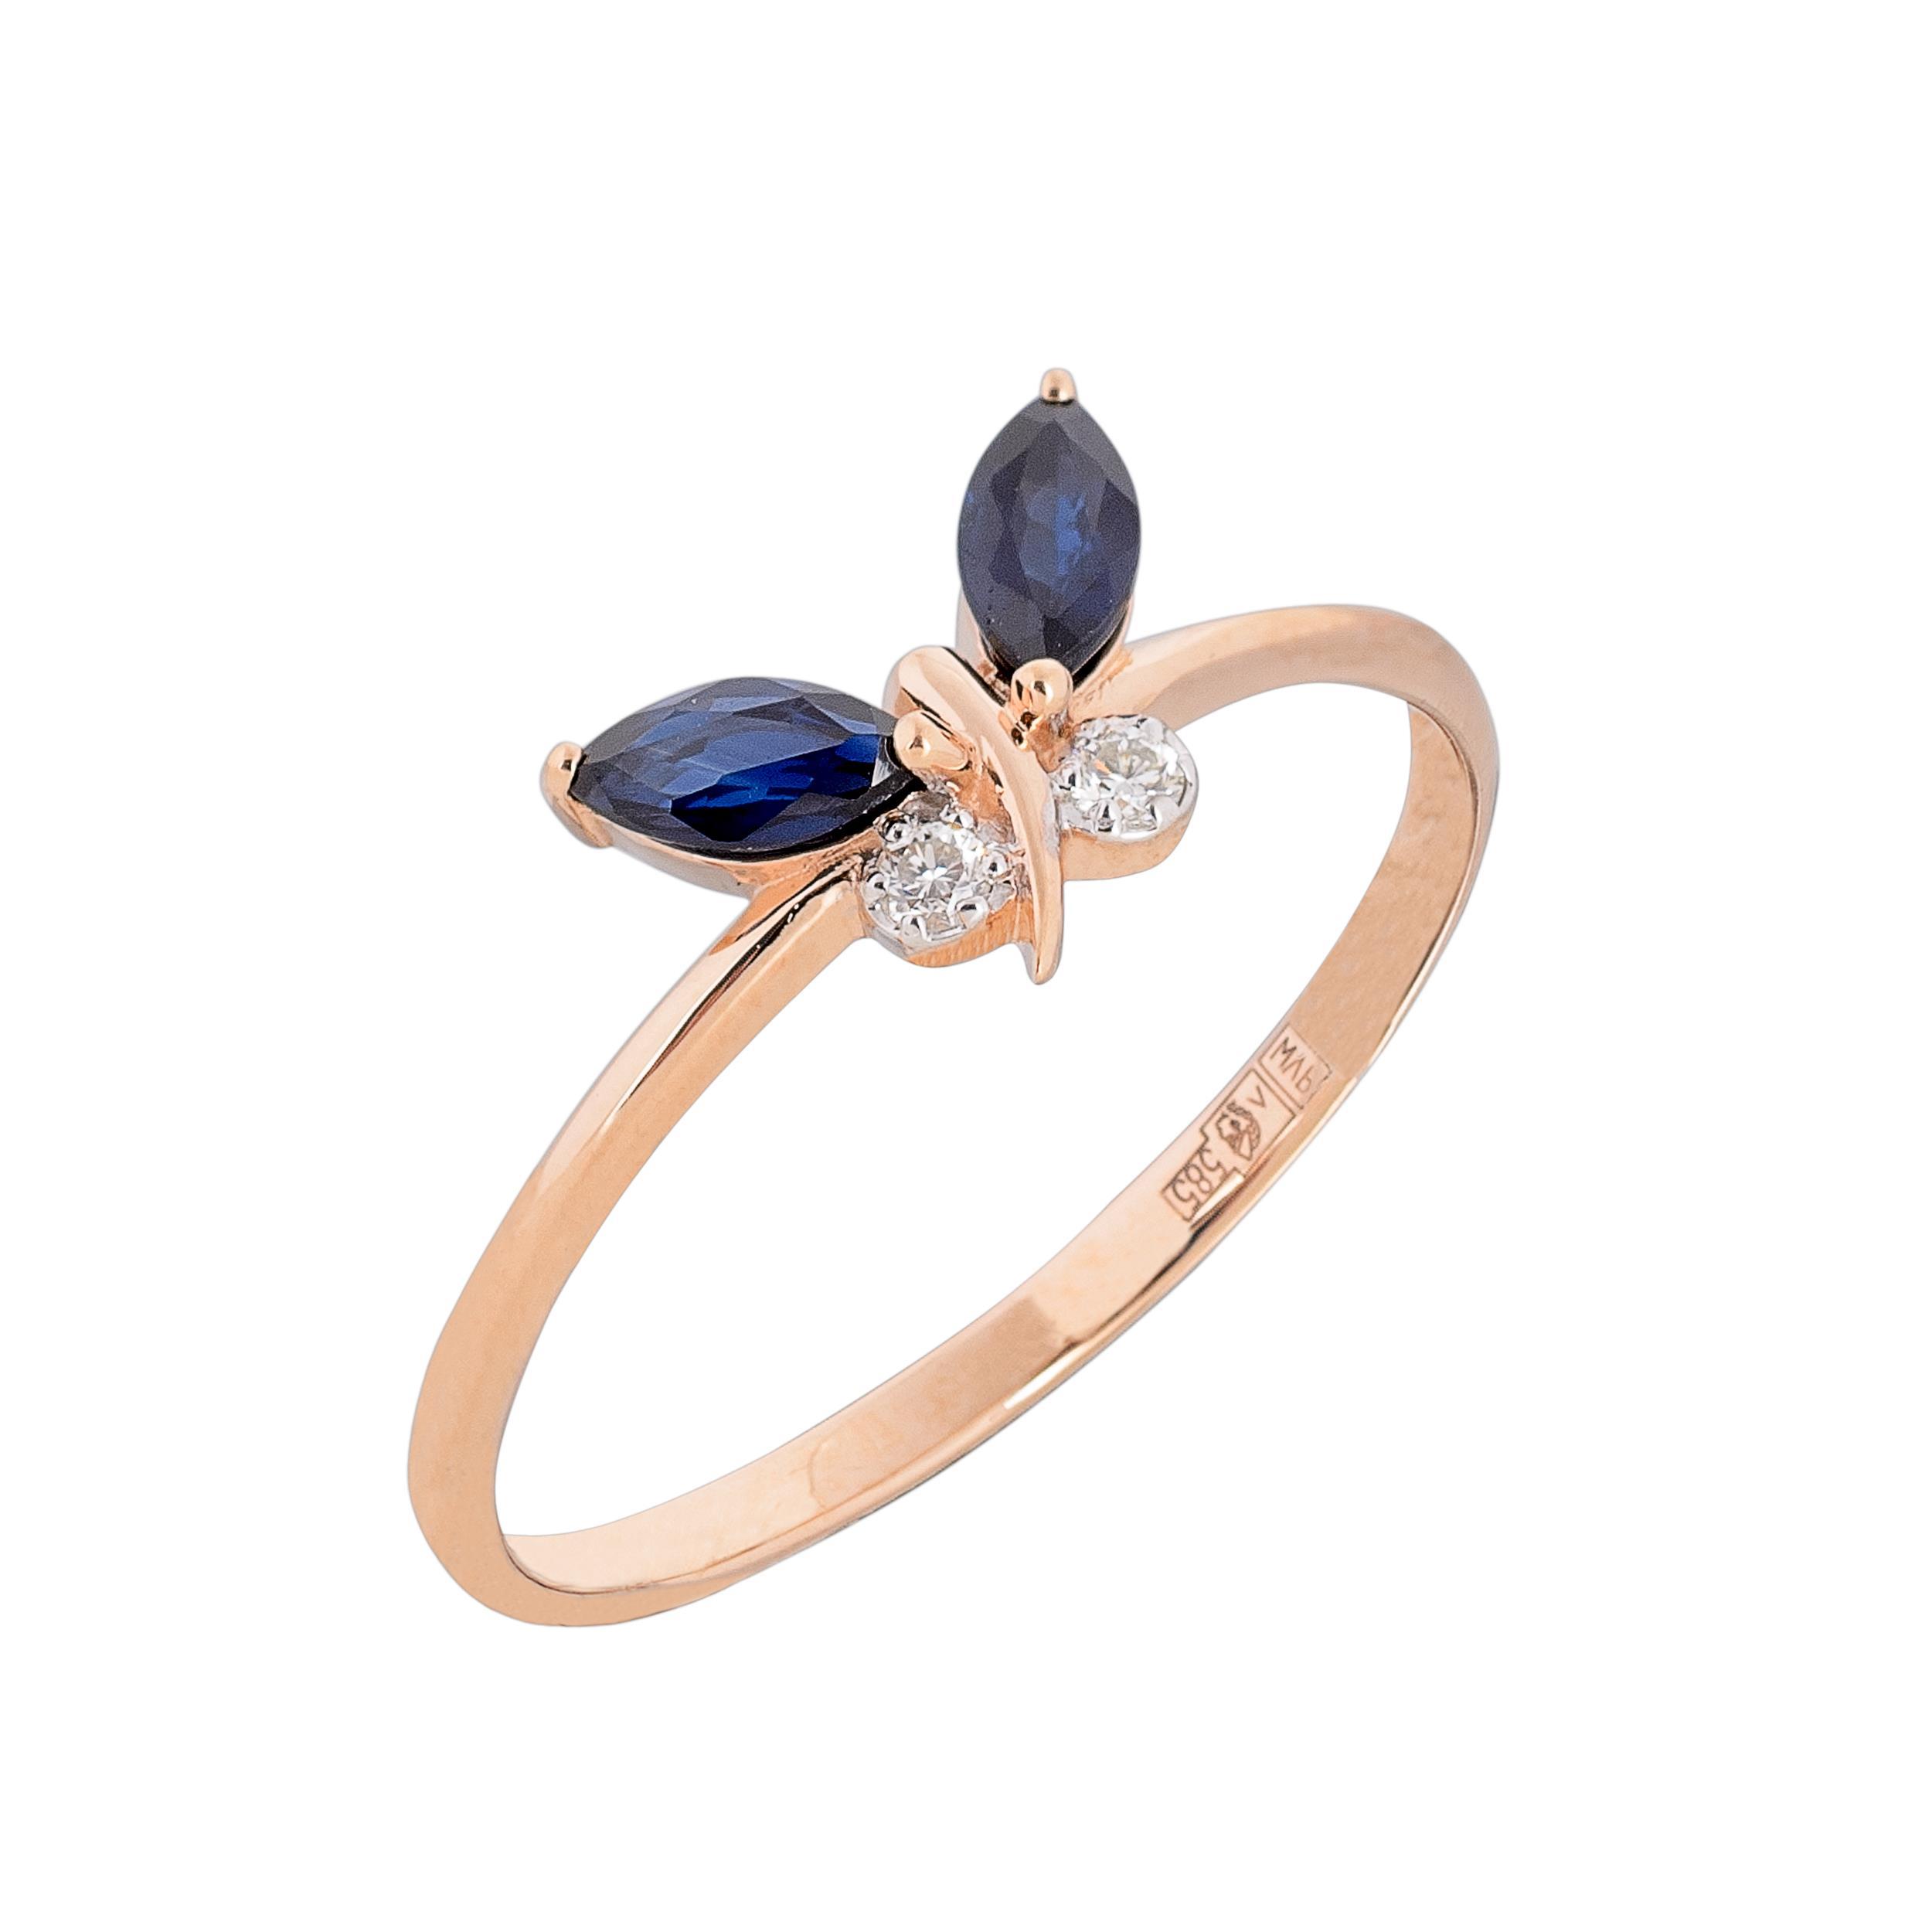 Золотое кольцо Бриллиант и Сапфир арт. 911027с 911027с